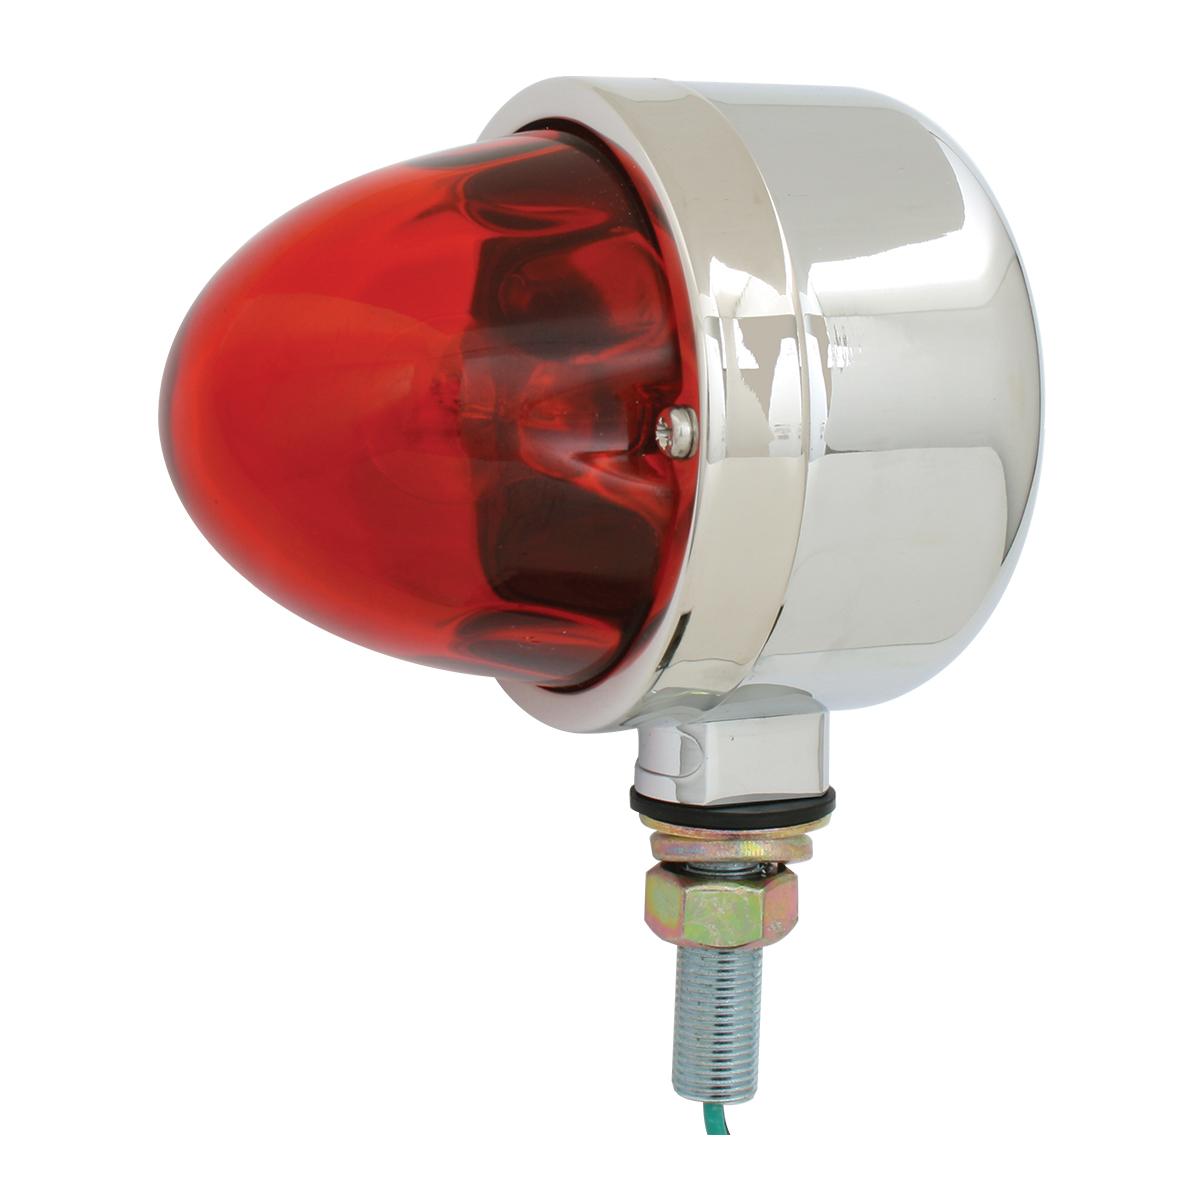 78110 Single Face Chrome Die Cast Auxiliary Light with Glass Lens